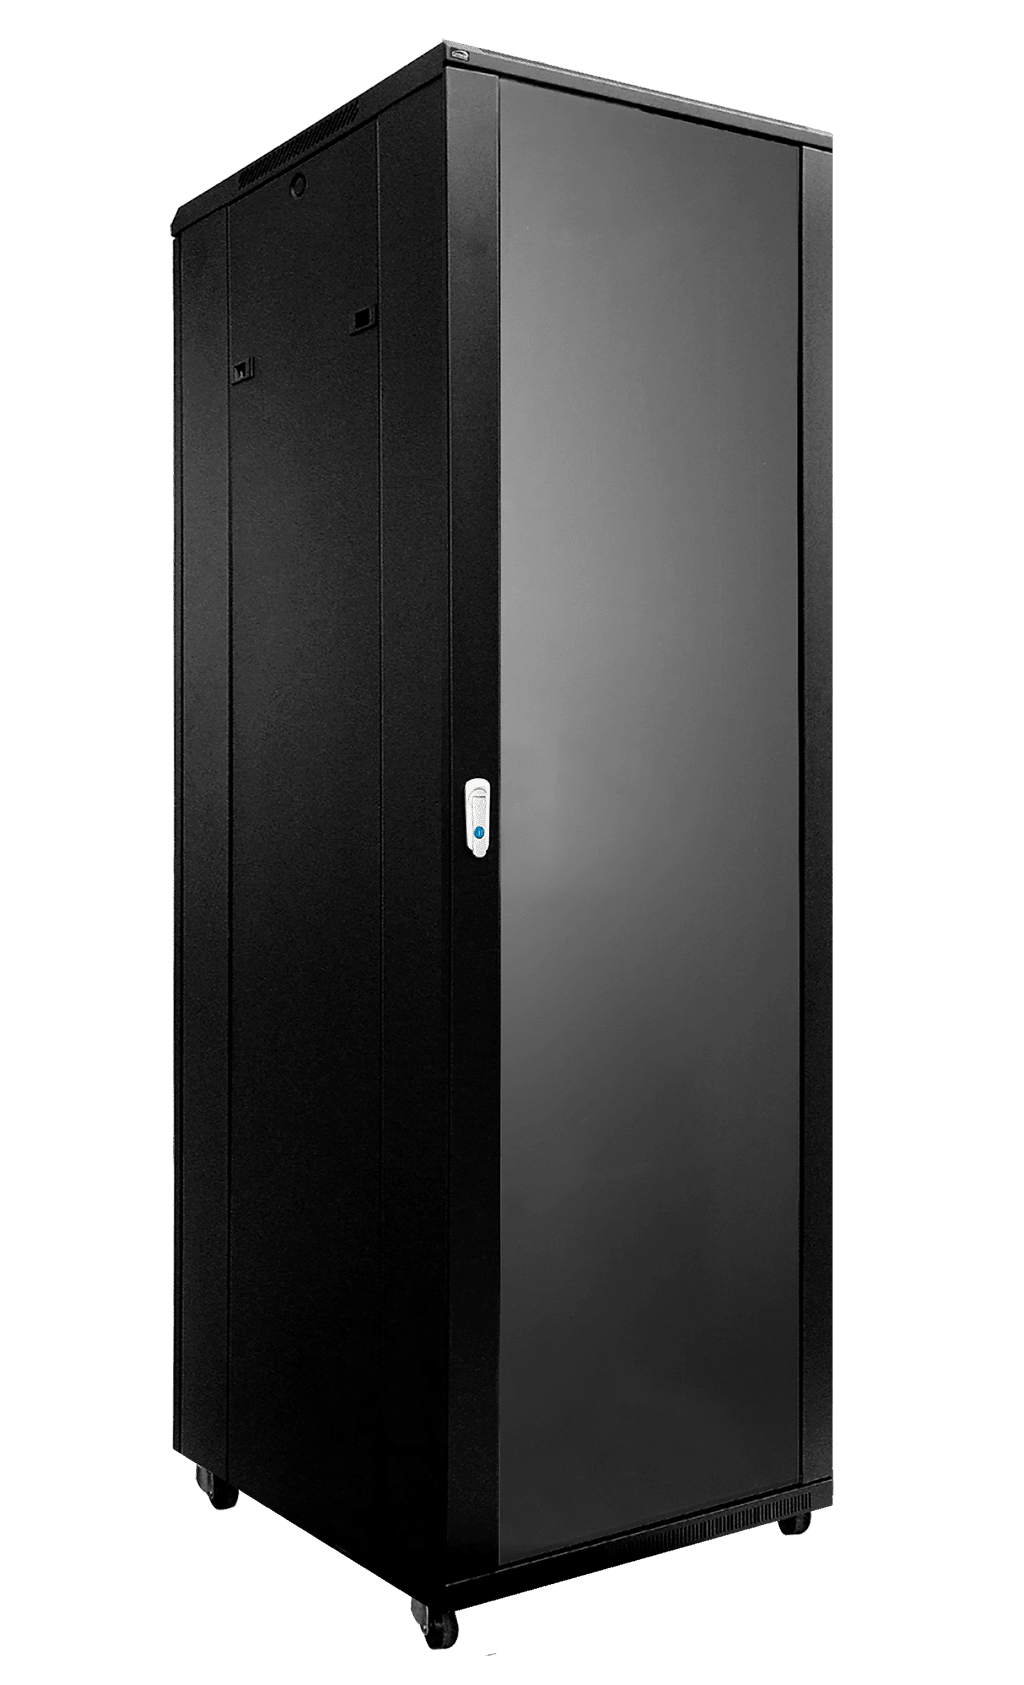 "SPR842 - 19"" rack cabinet - 42 units - 800mm depth"